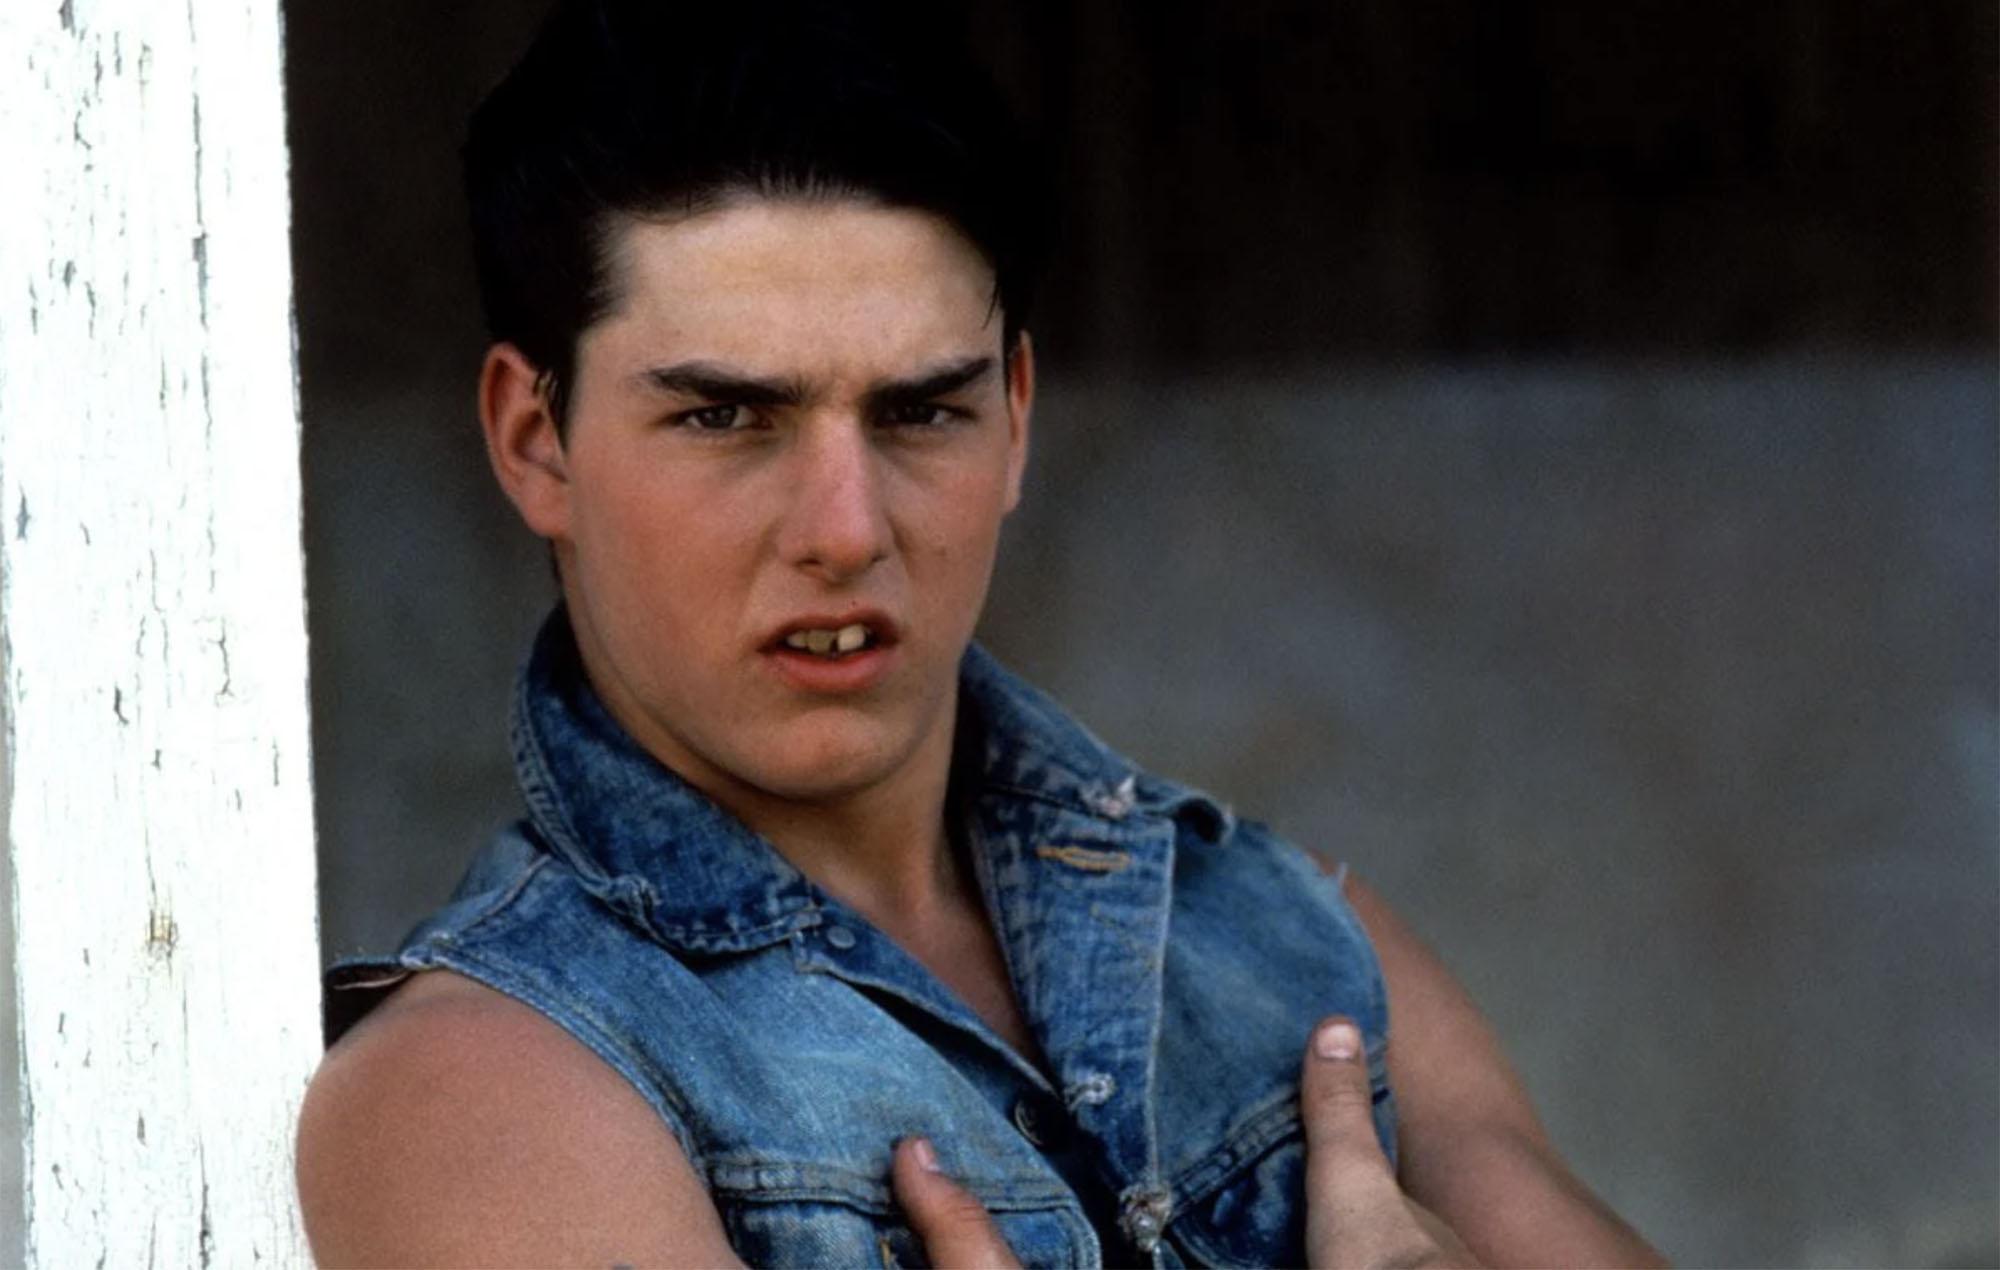 Steve Randle (Tom Cruise) - The Outsiders